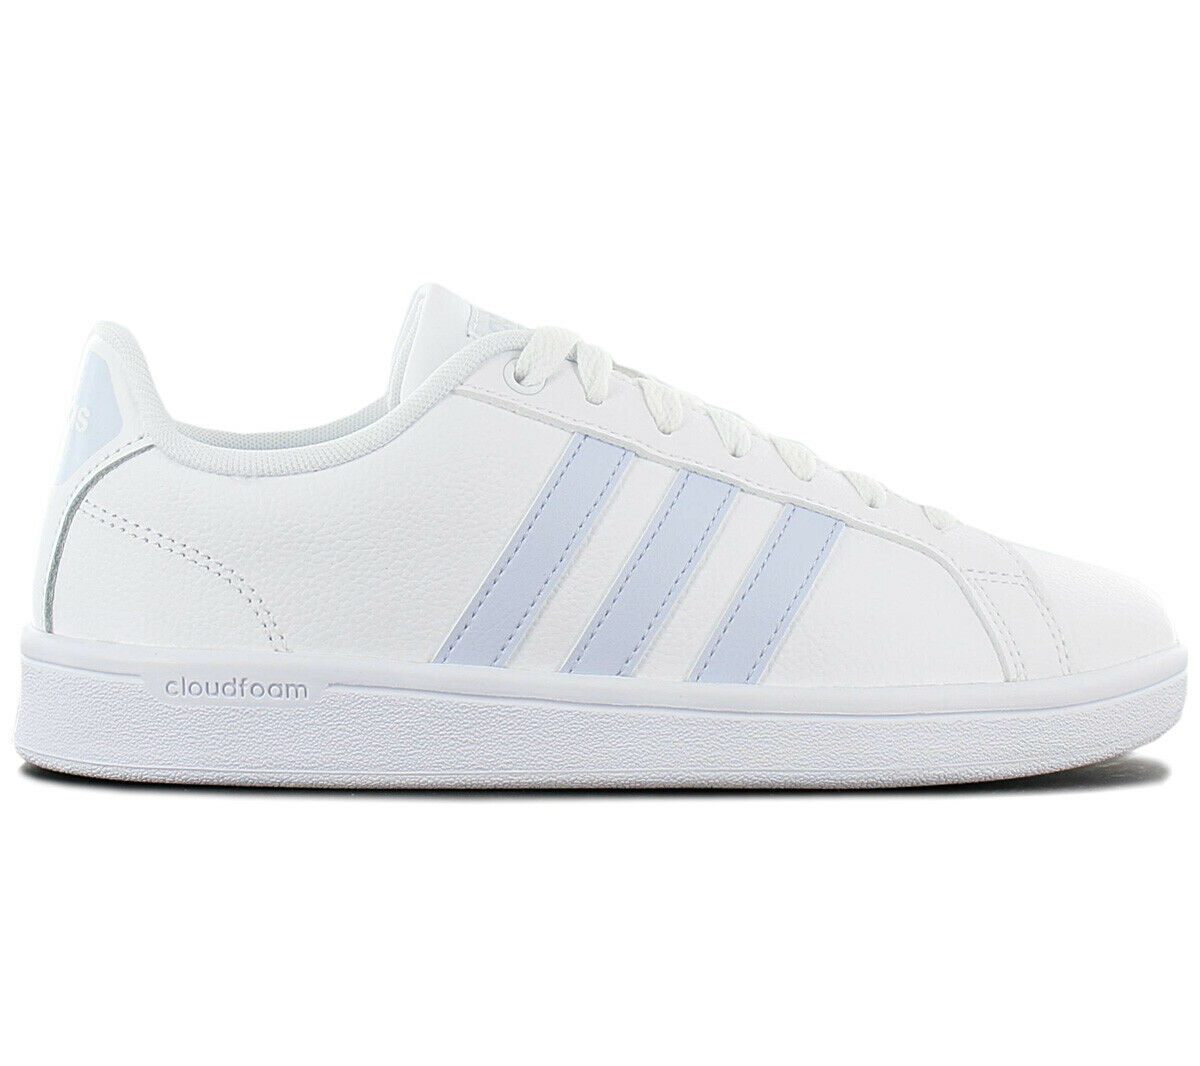 Adidas CloudFoam Advantage CF Damen Turnschuhe B28095 Weiß Schuhe Fashion Turnschuh